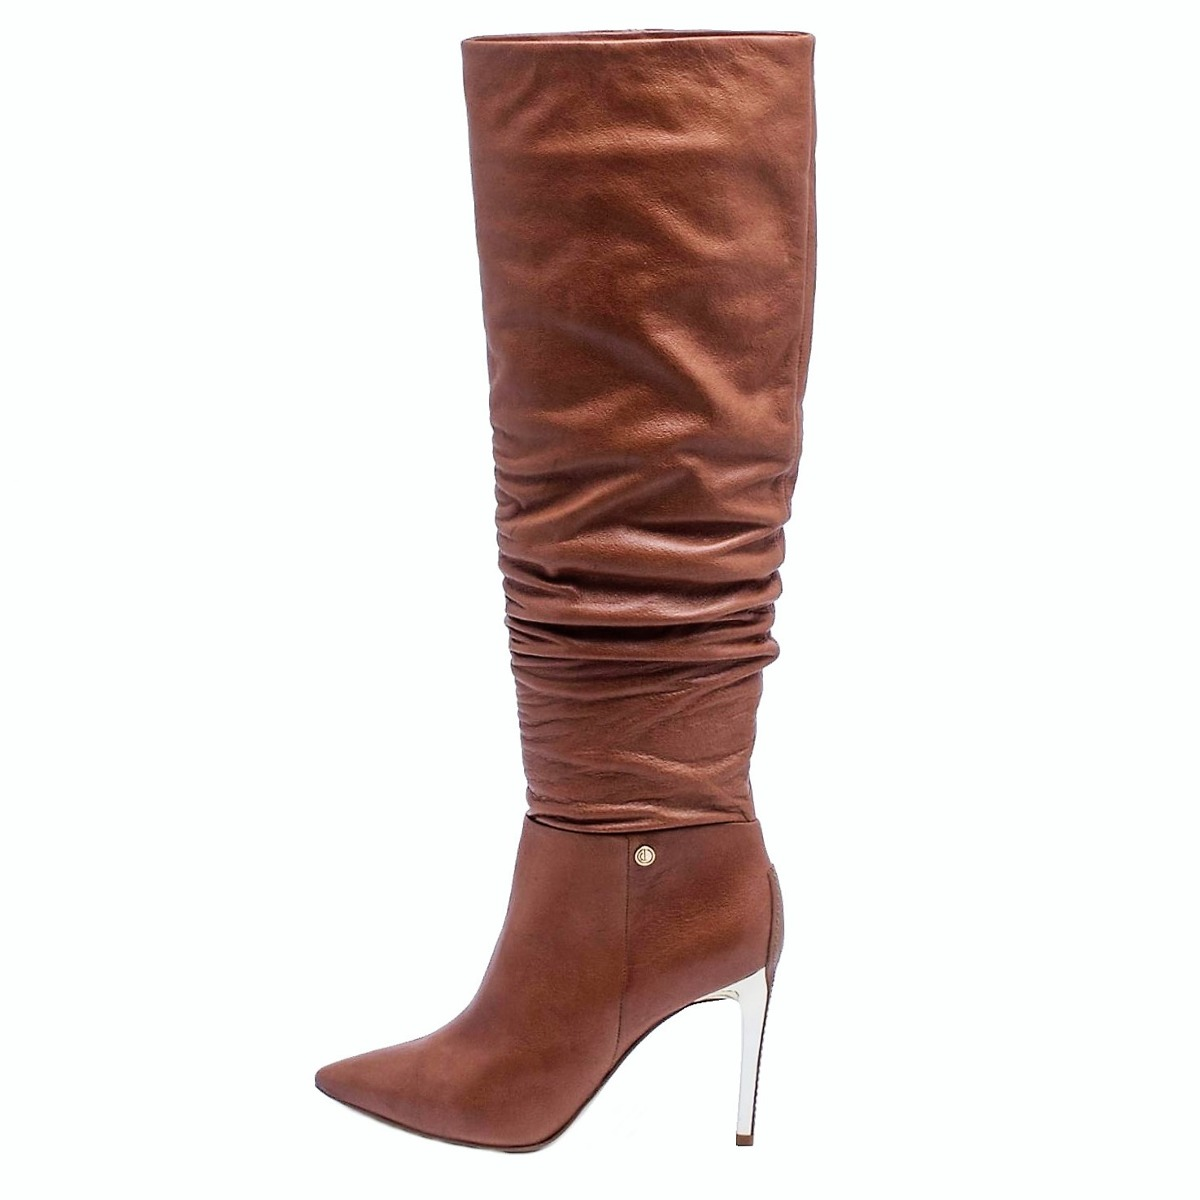 e881f8569a bota feminina dumond slouch over knee bico fino salto alto 4. Carregando  zoom.